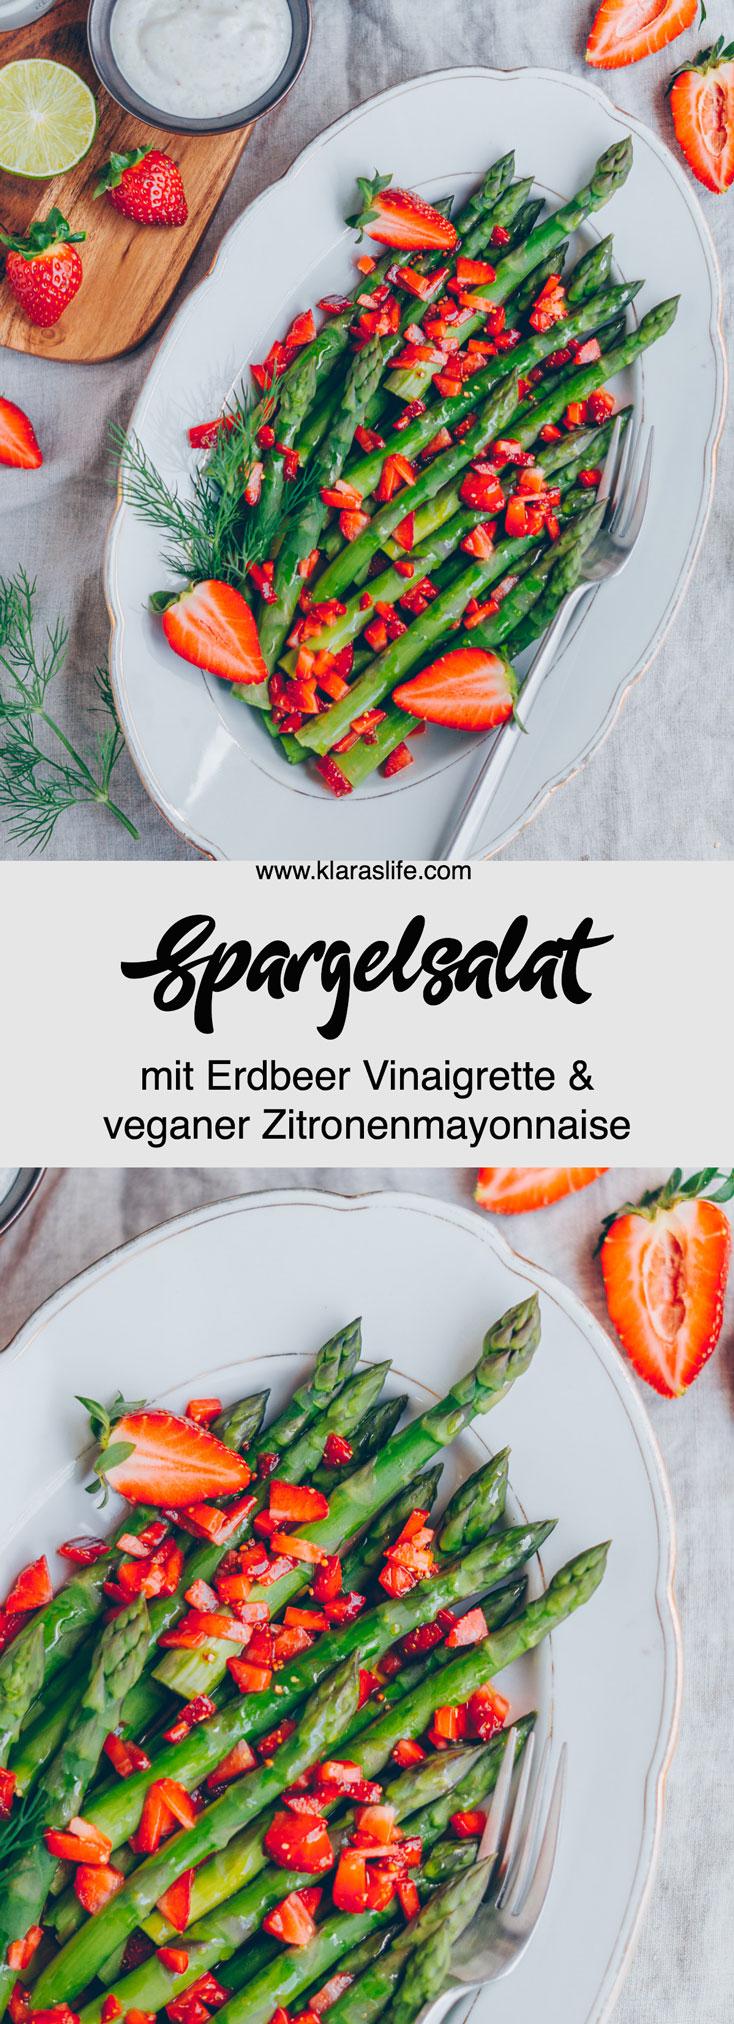 vegane rezepte mit spargel